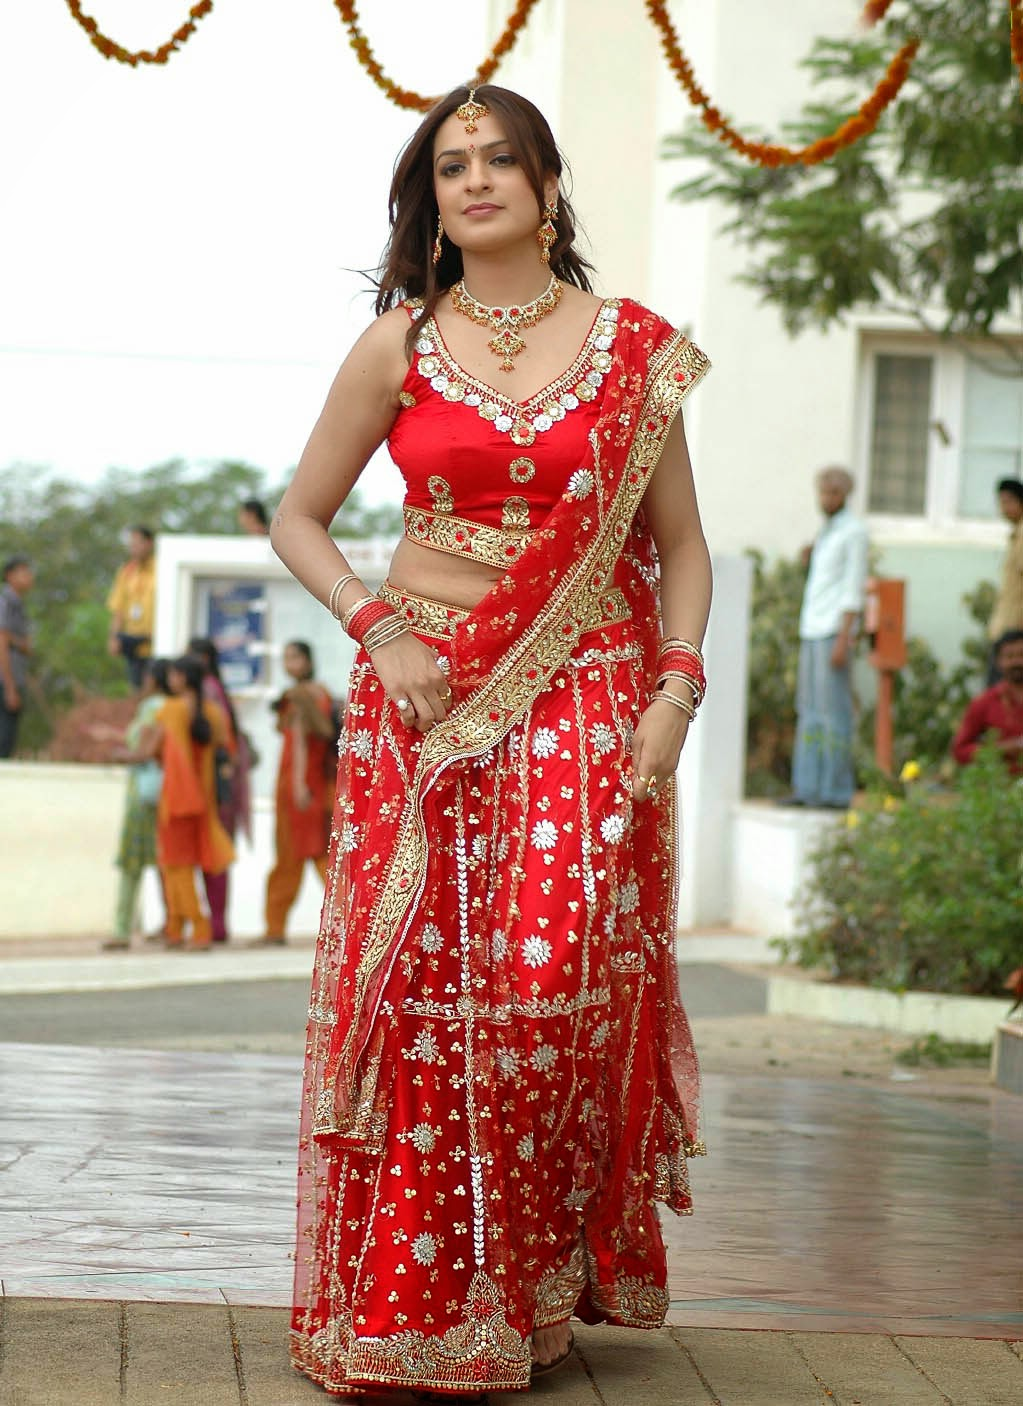 Aditi Agarwal hot stills